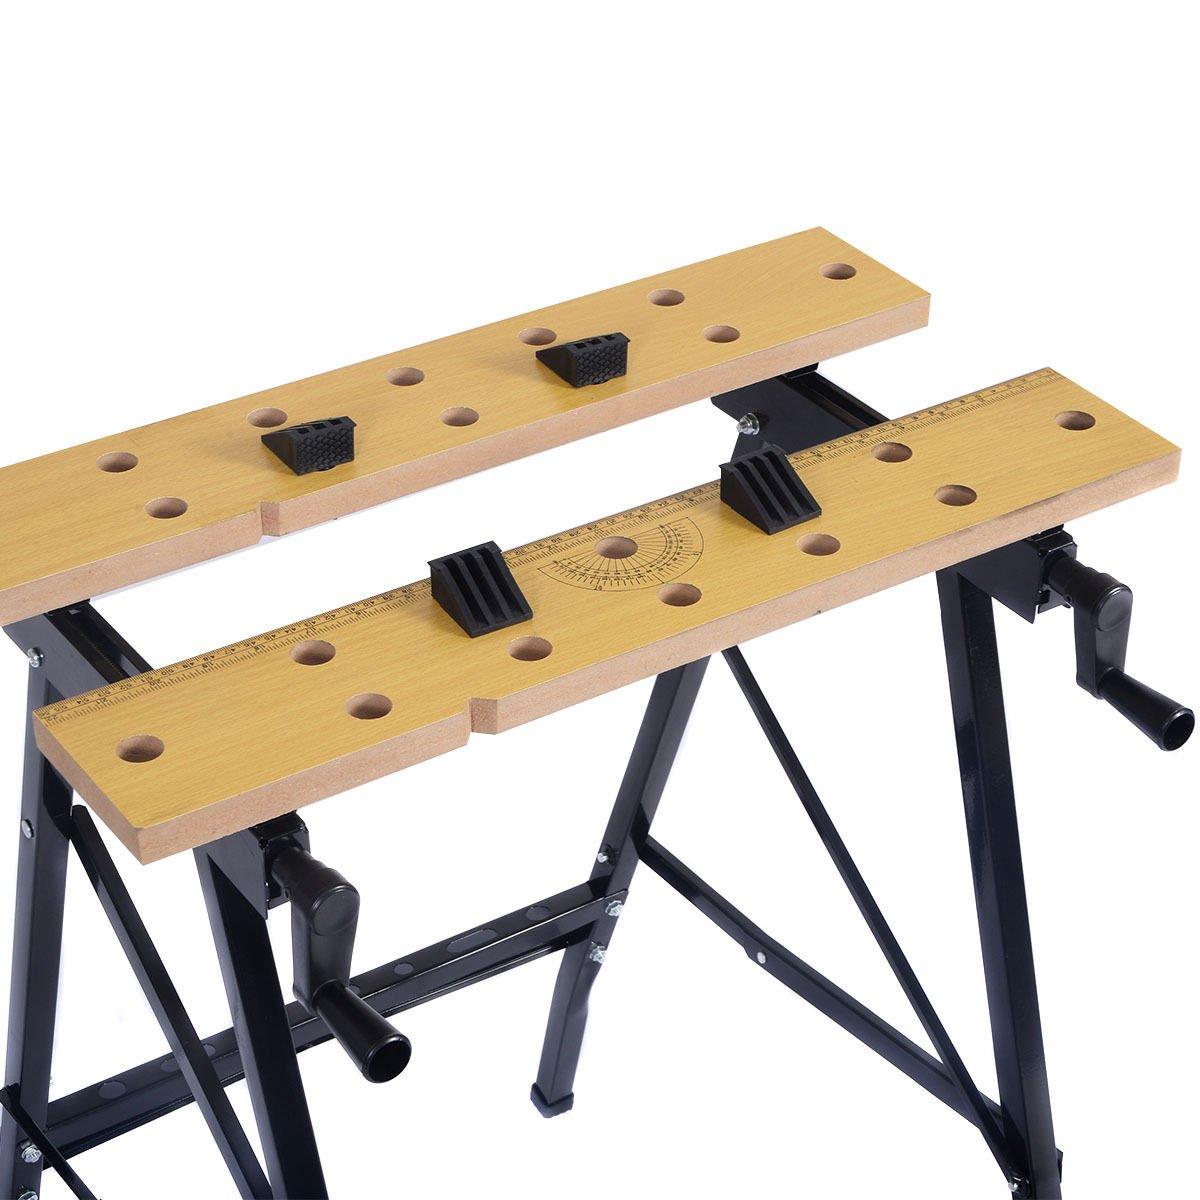 BENCH TABLE TOOL GARAGE REPAIR WORKSHOP